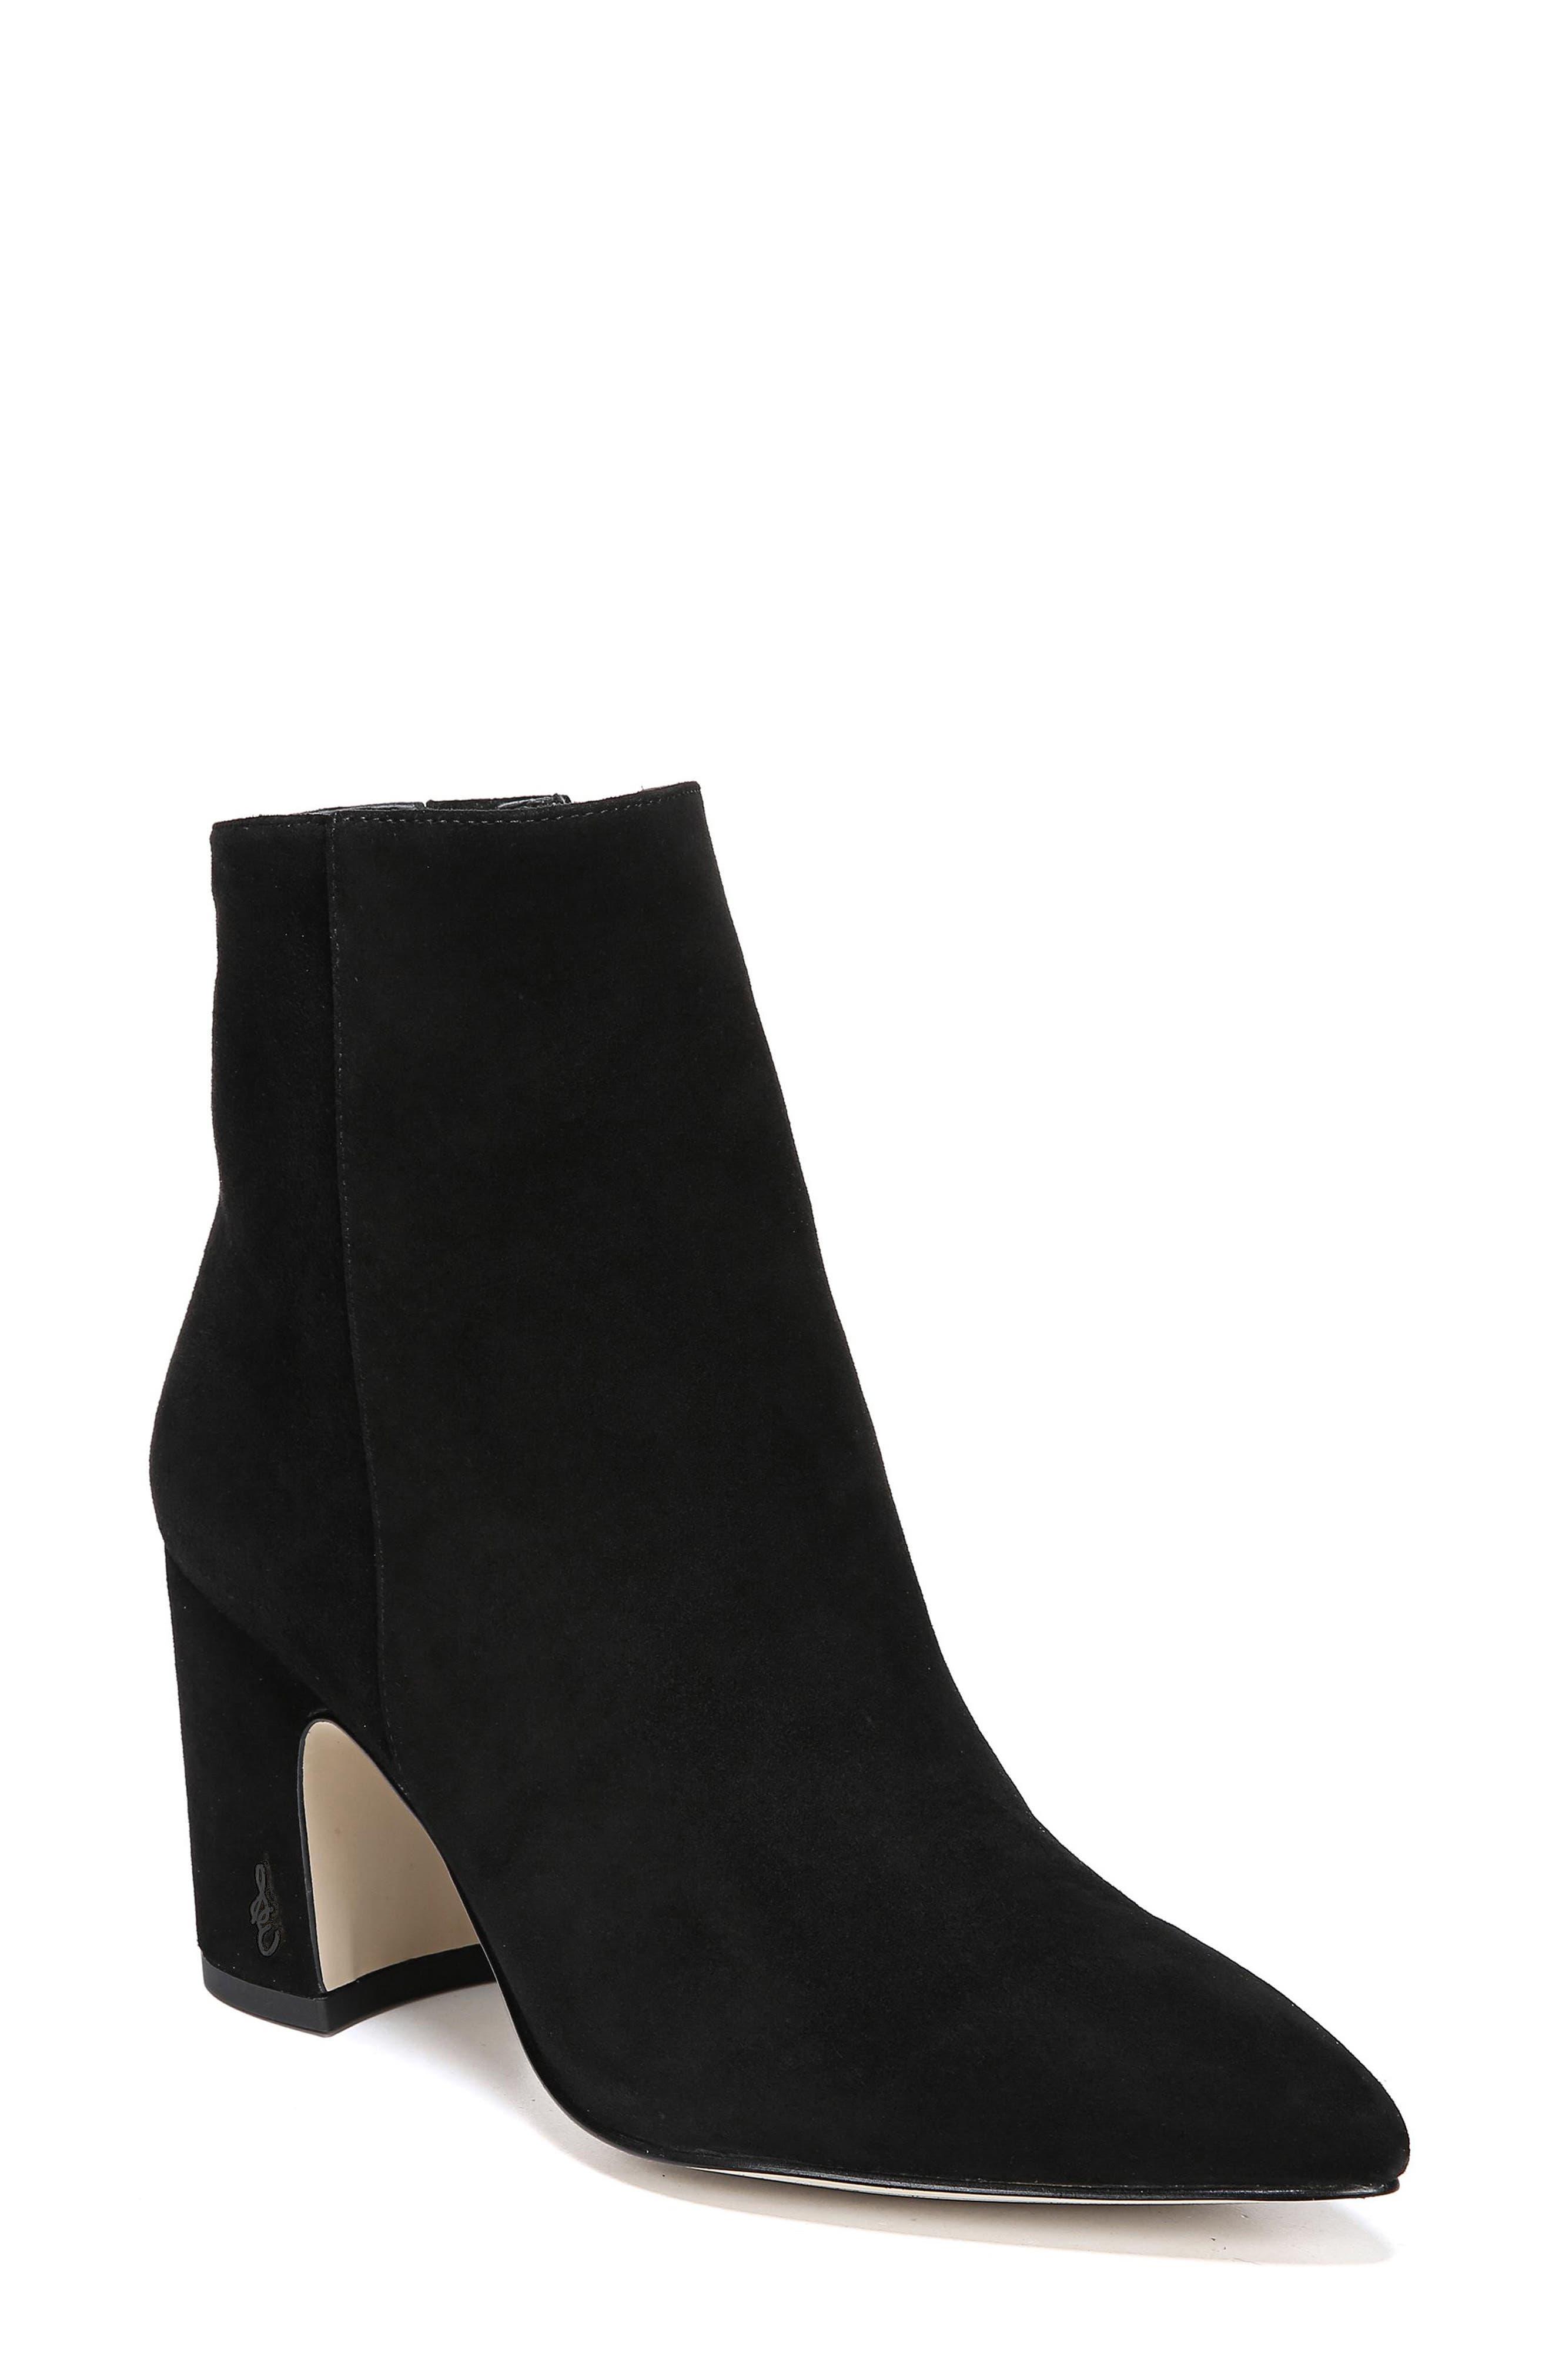 c69828ff6b40a8 Women s Sam Edelman Booties   Ankle Boots